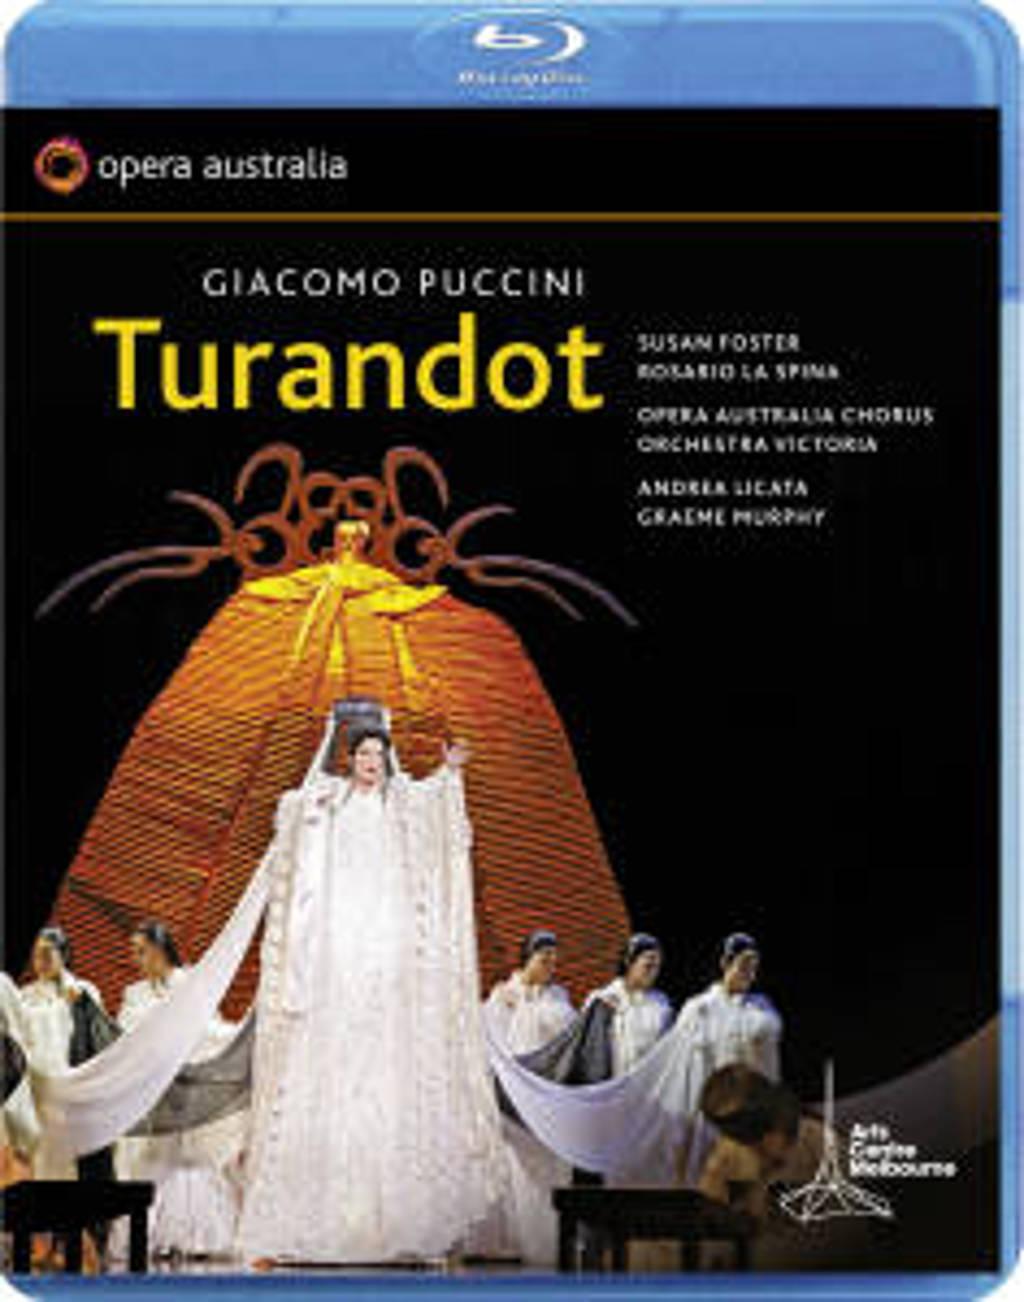 Foster,La Spina,Kwon,Arthur - Turandot, Arts Centre Melbourne 201 (Blu-ray)